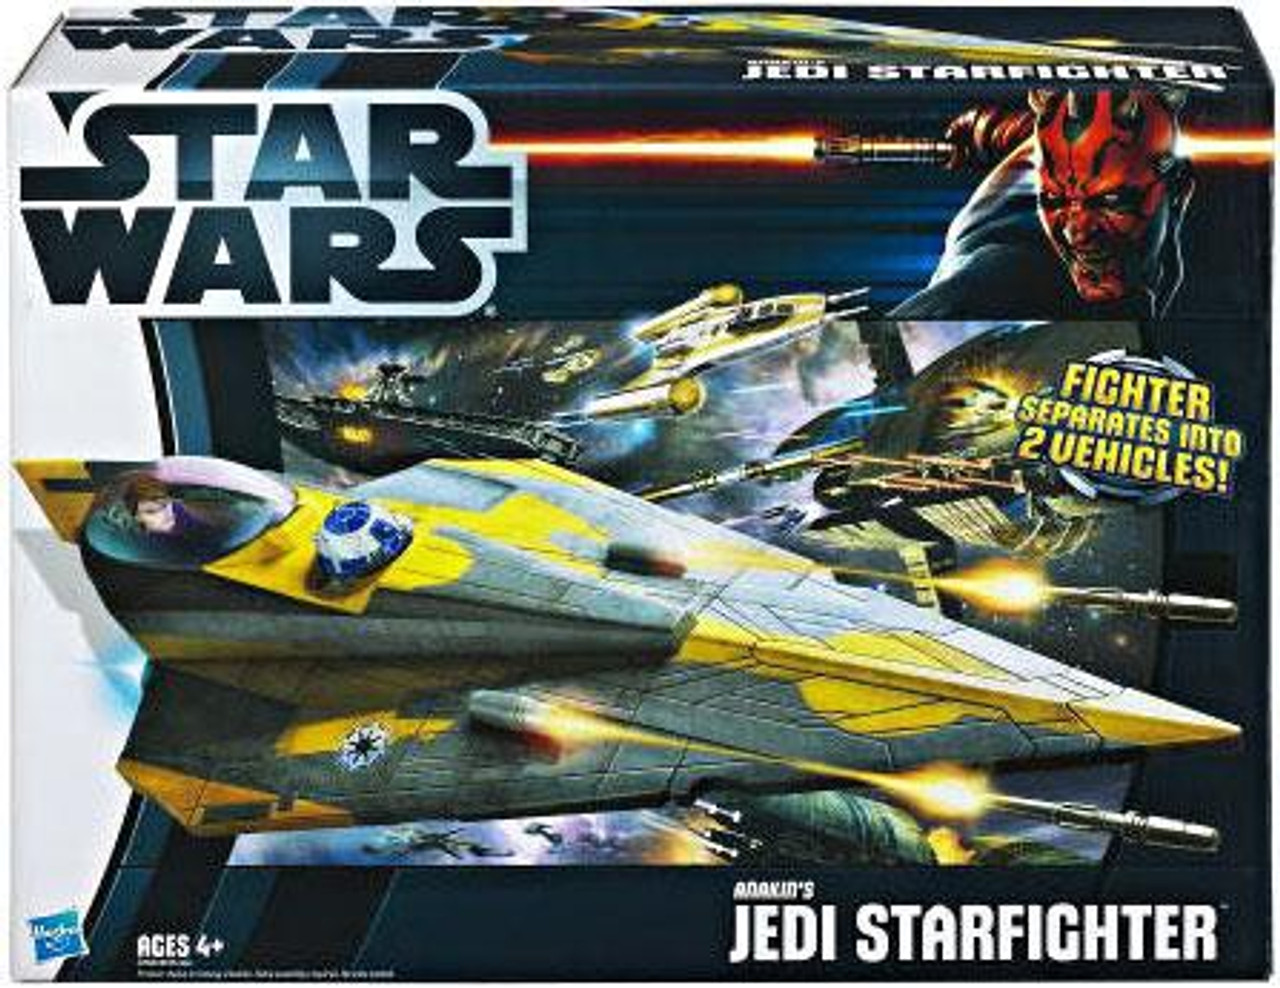 Star Wars The Clone Wars Vehicles 2012 Anakin's Jedi Starfighter Action Figure Vehicle